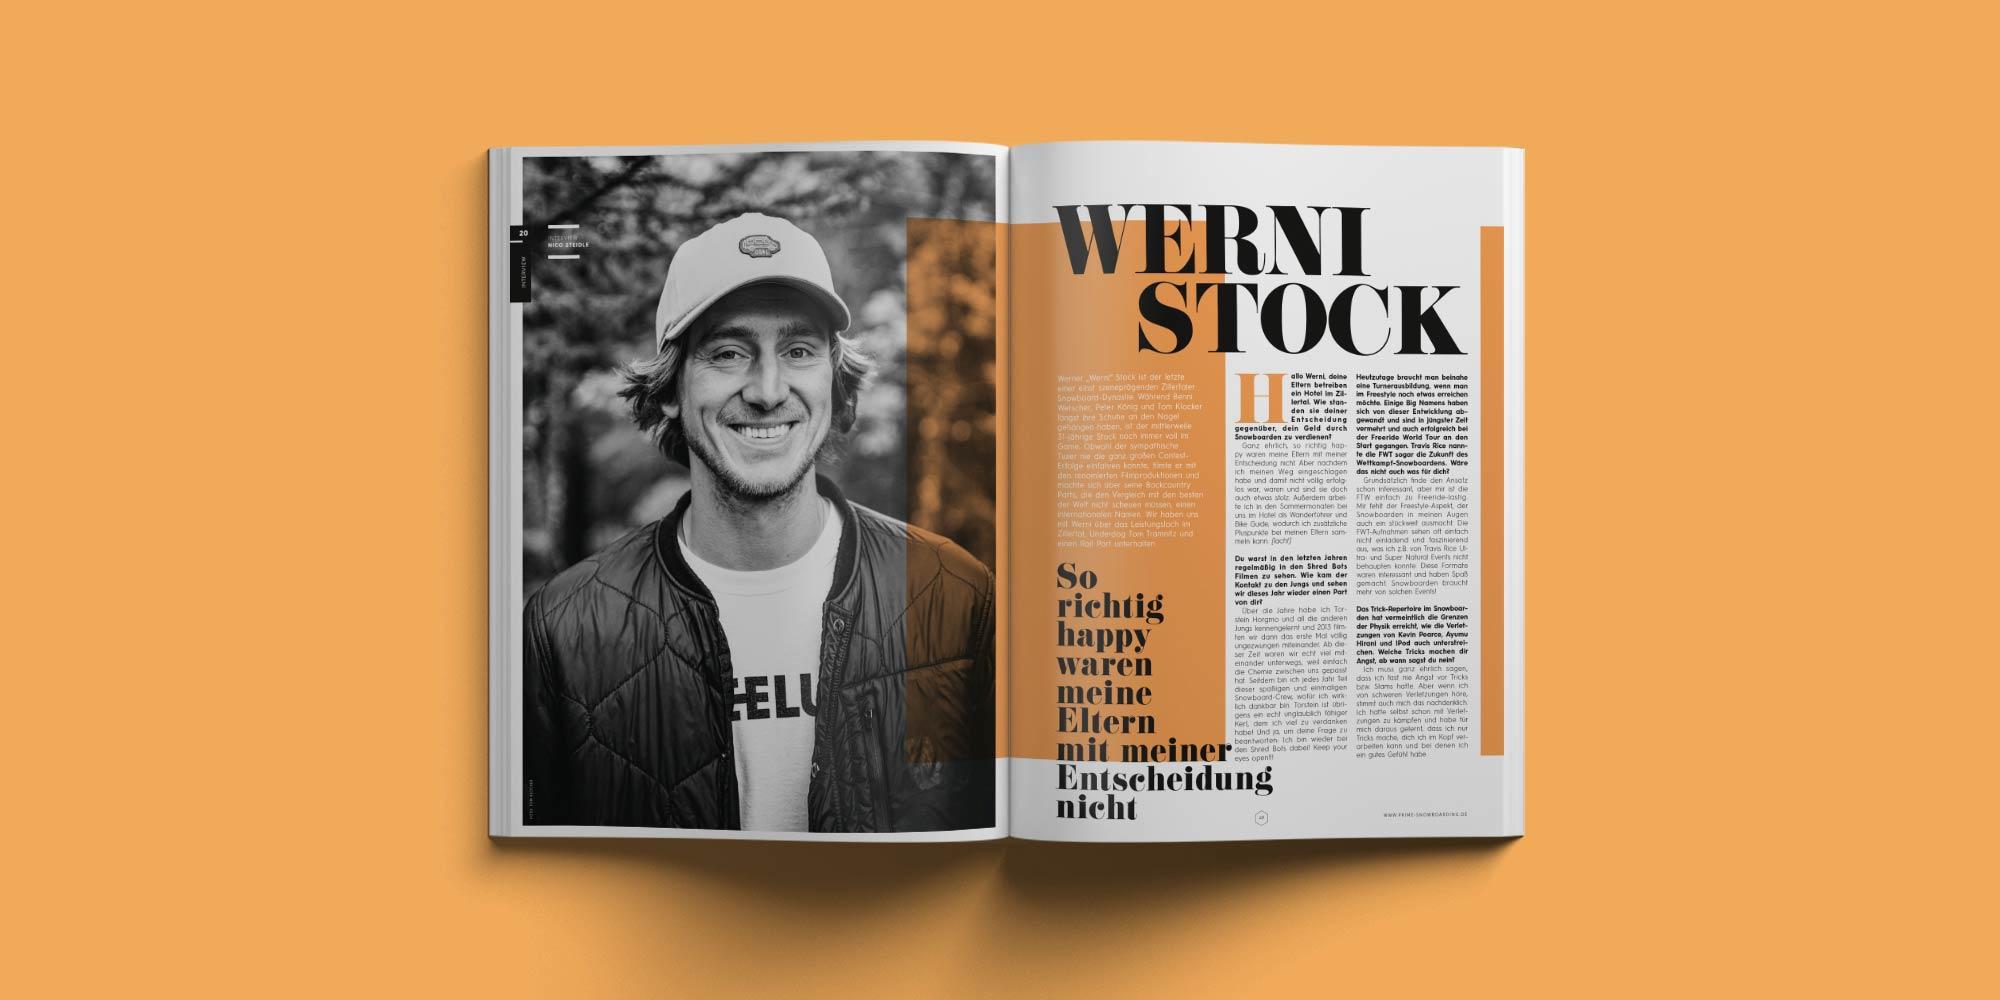 PRIME Snowboarding Printausgabe 20 - Werni Stock im Interview